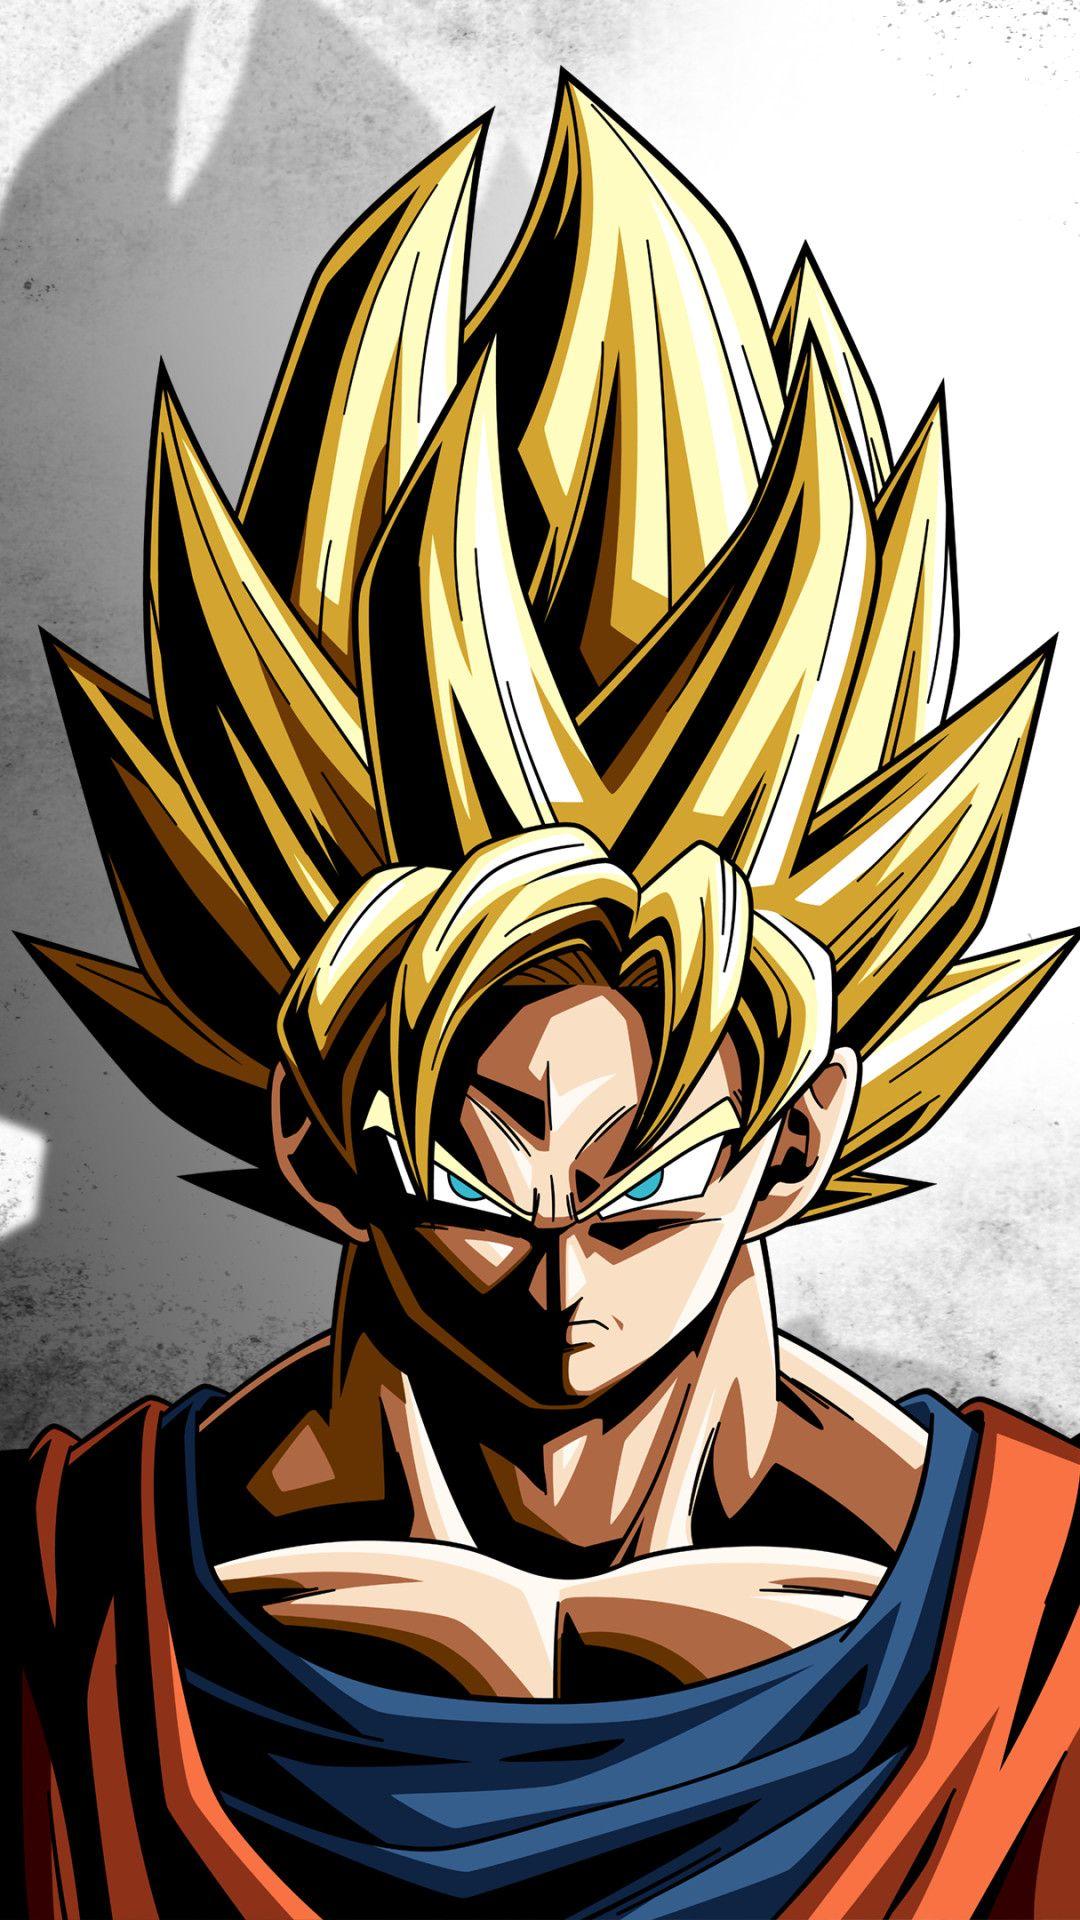 Free Download Dragon Ball Z Anime Iphone Wallpapers Goku